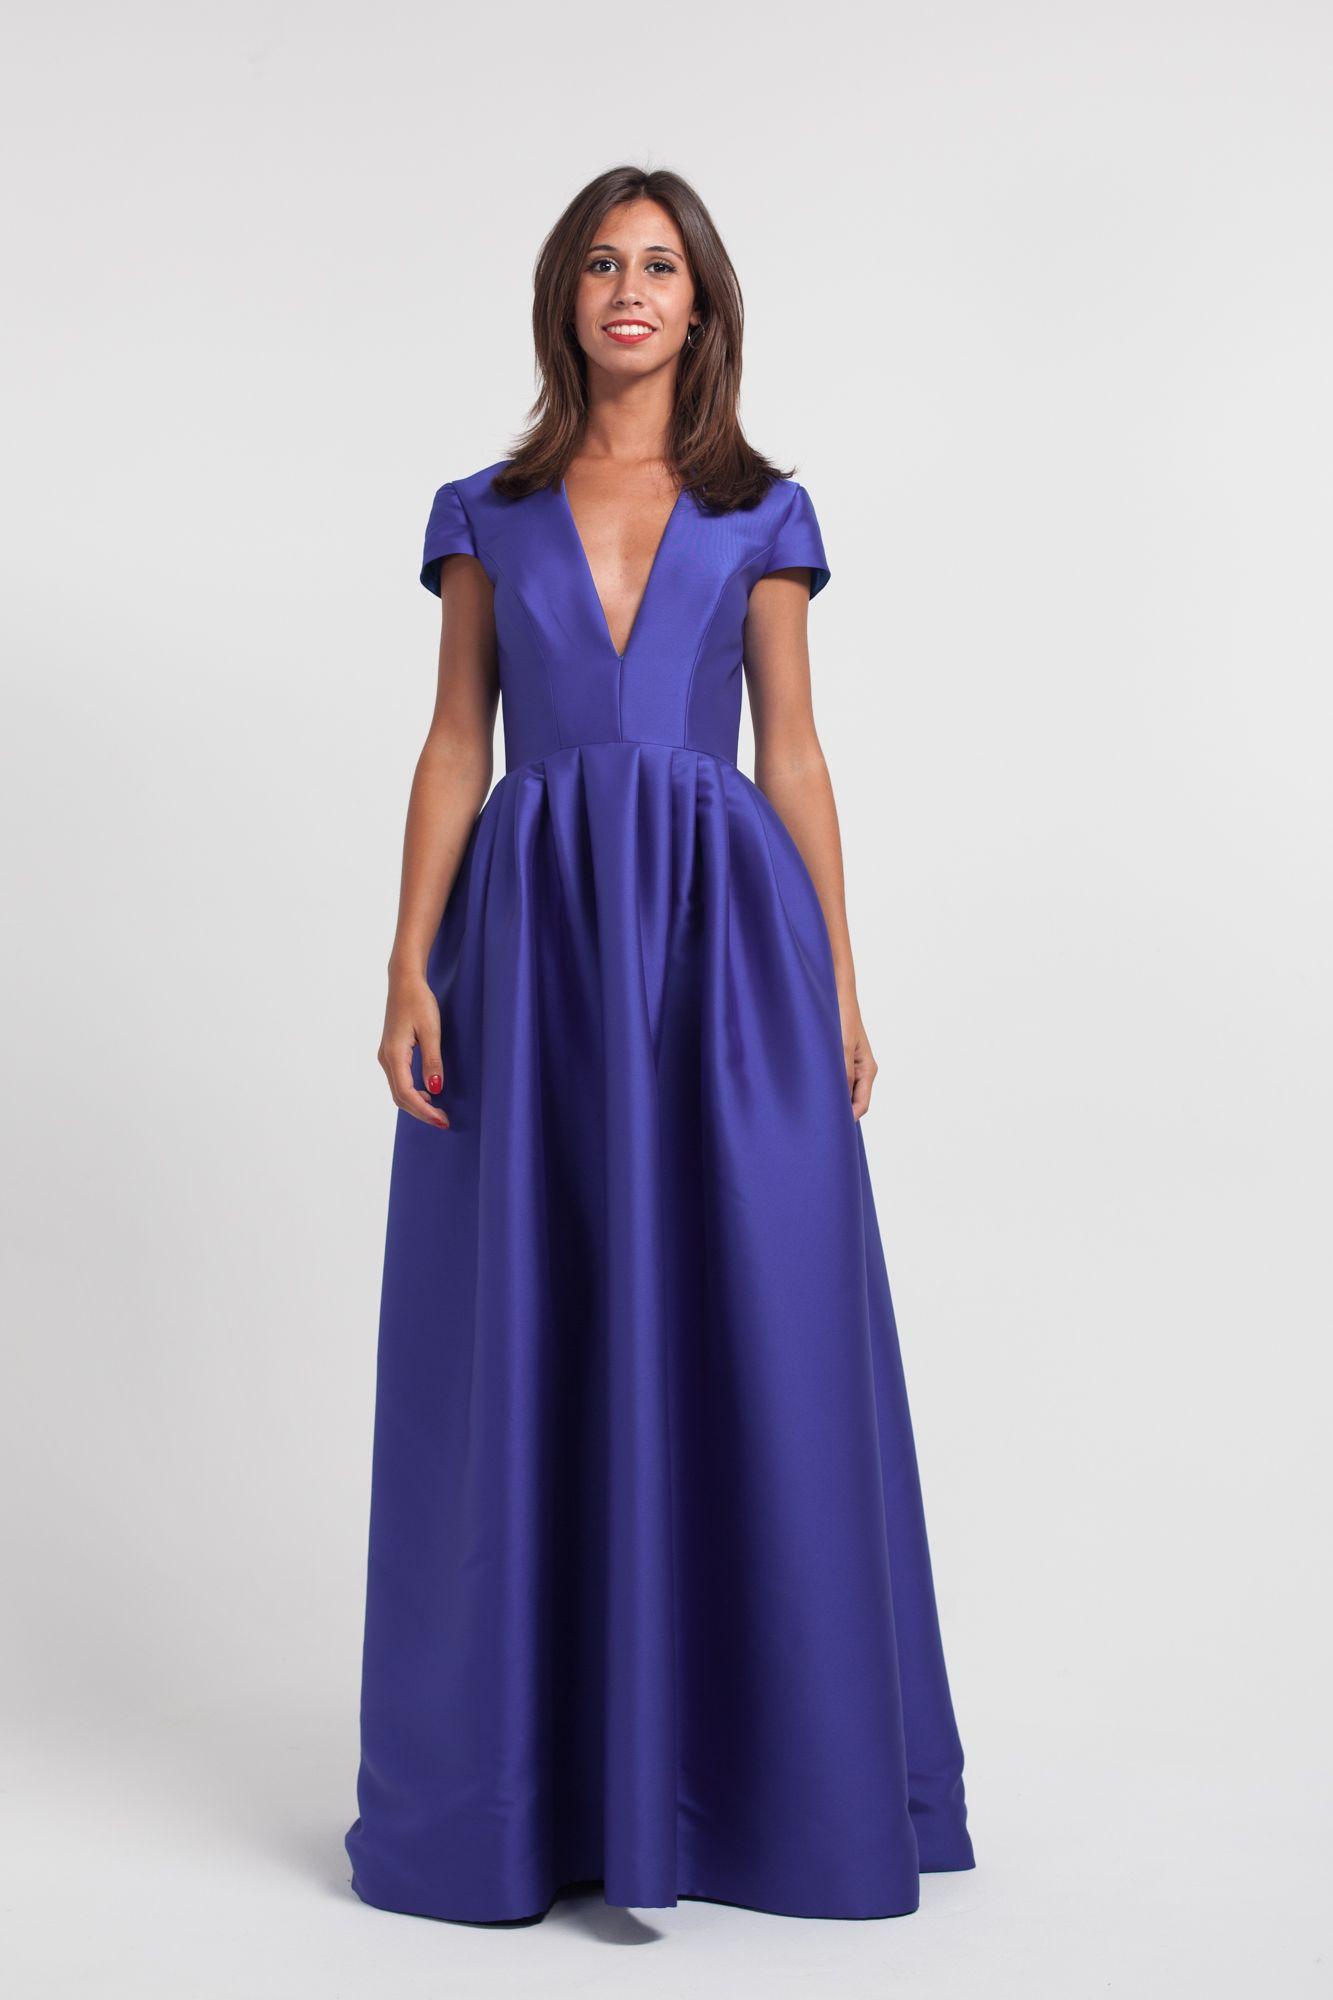 Vestido de encaje púrpura | Vestidos largos en alquiler | Pinterest ...